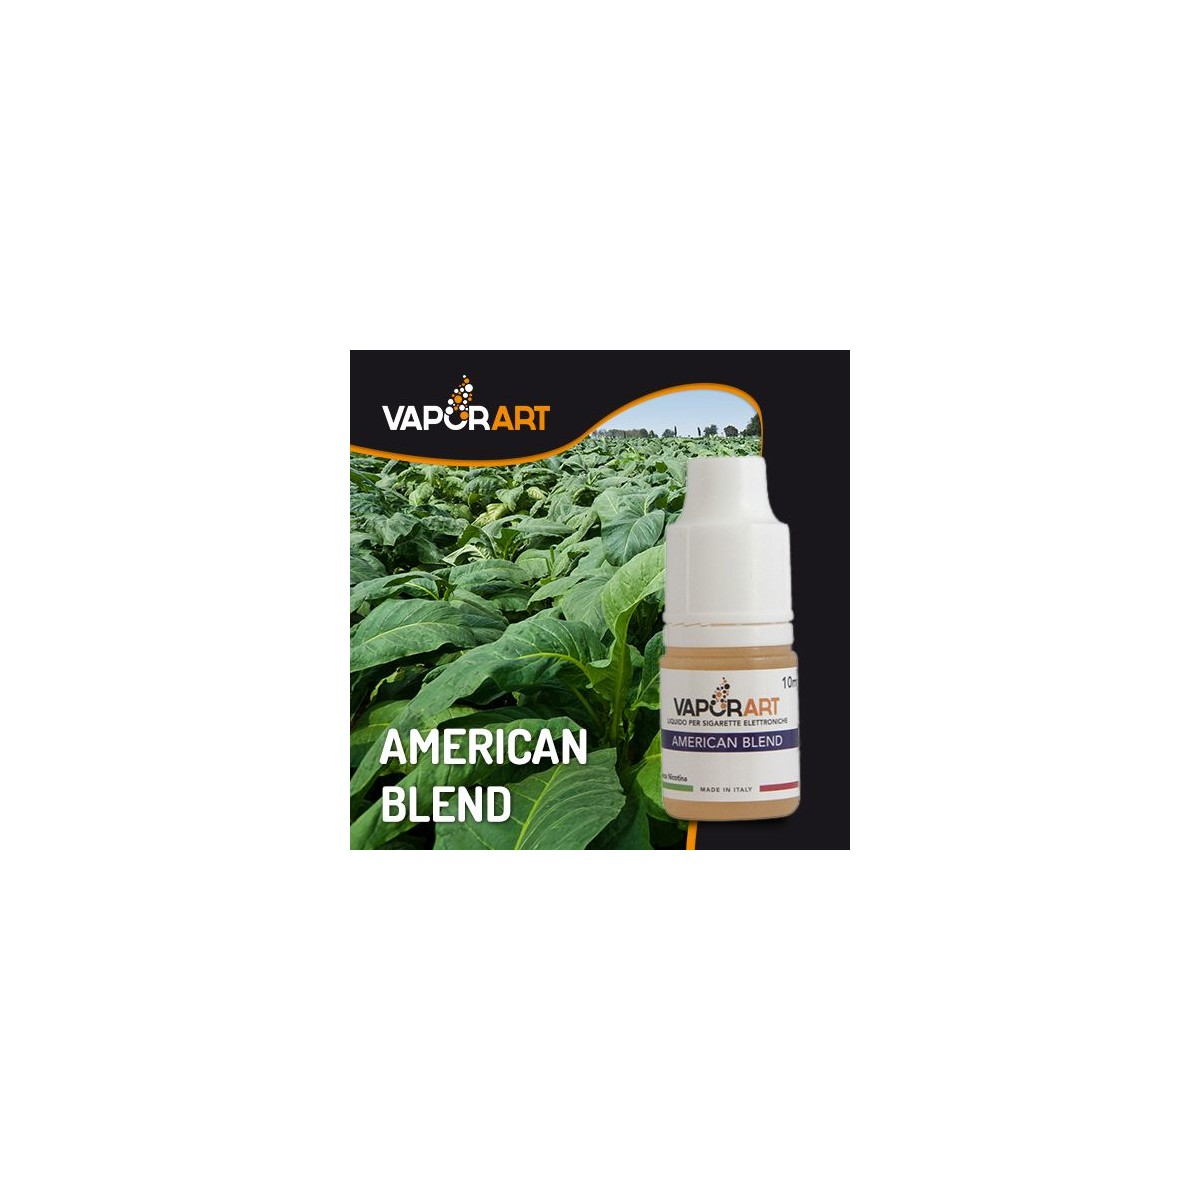 Vaporart American Blend liquido pronto 10ml